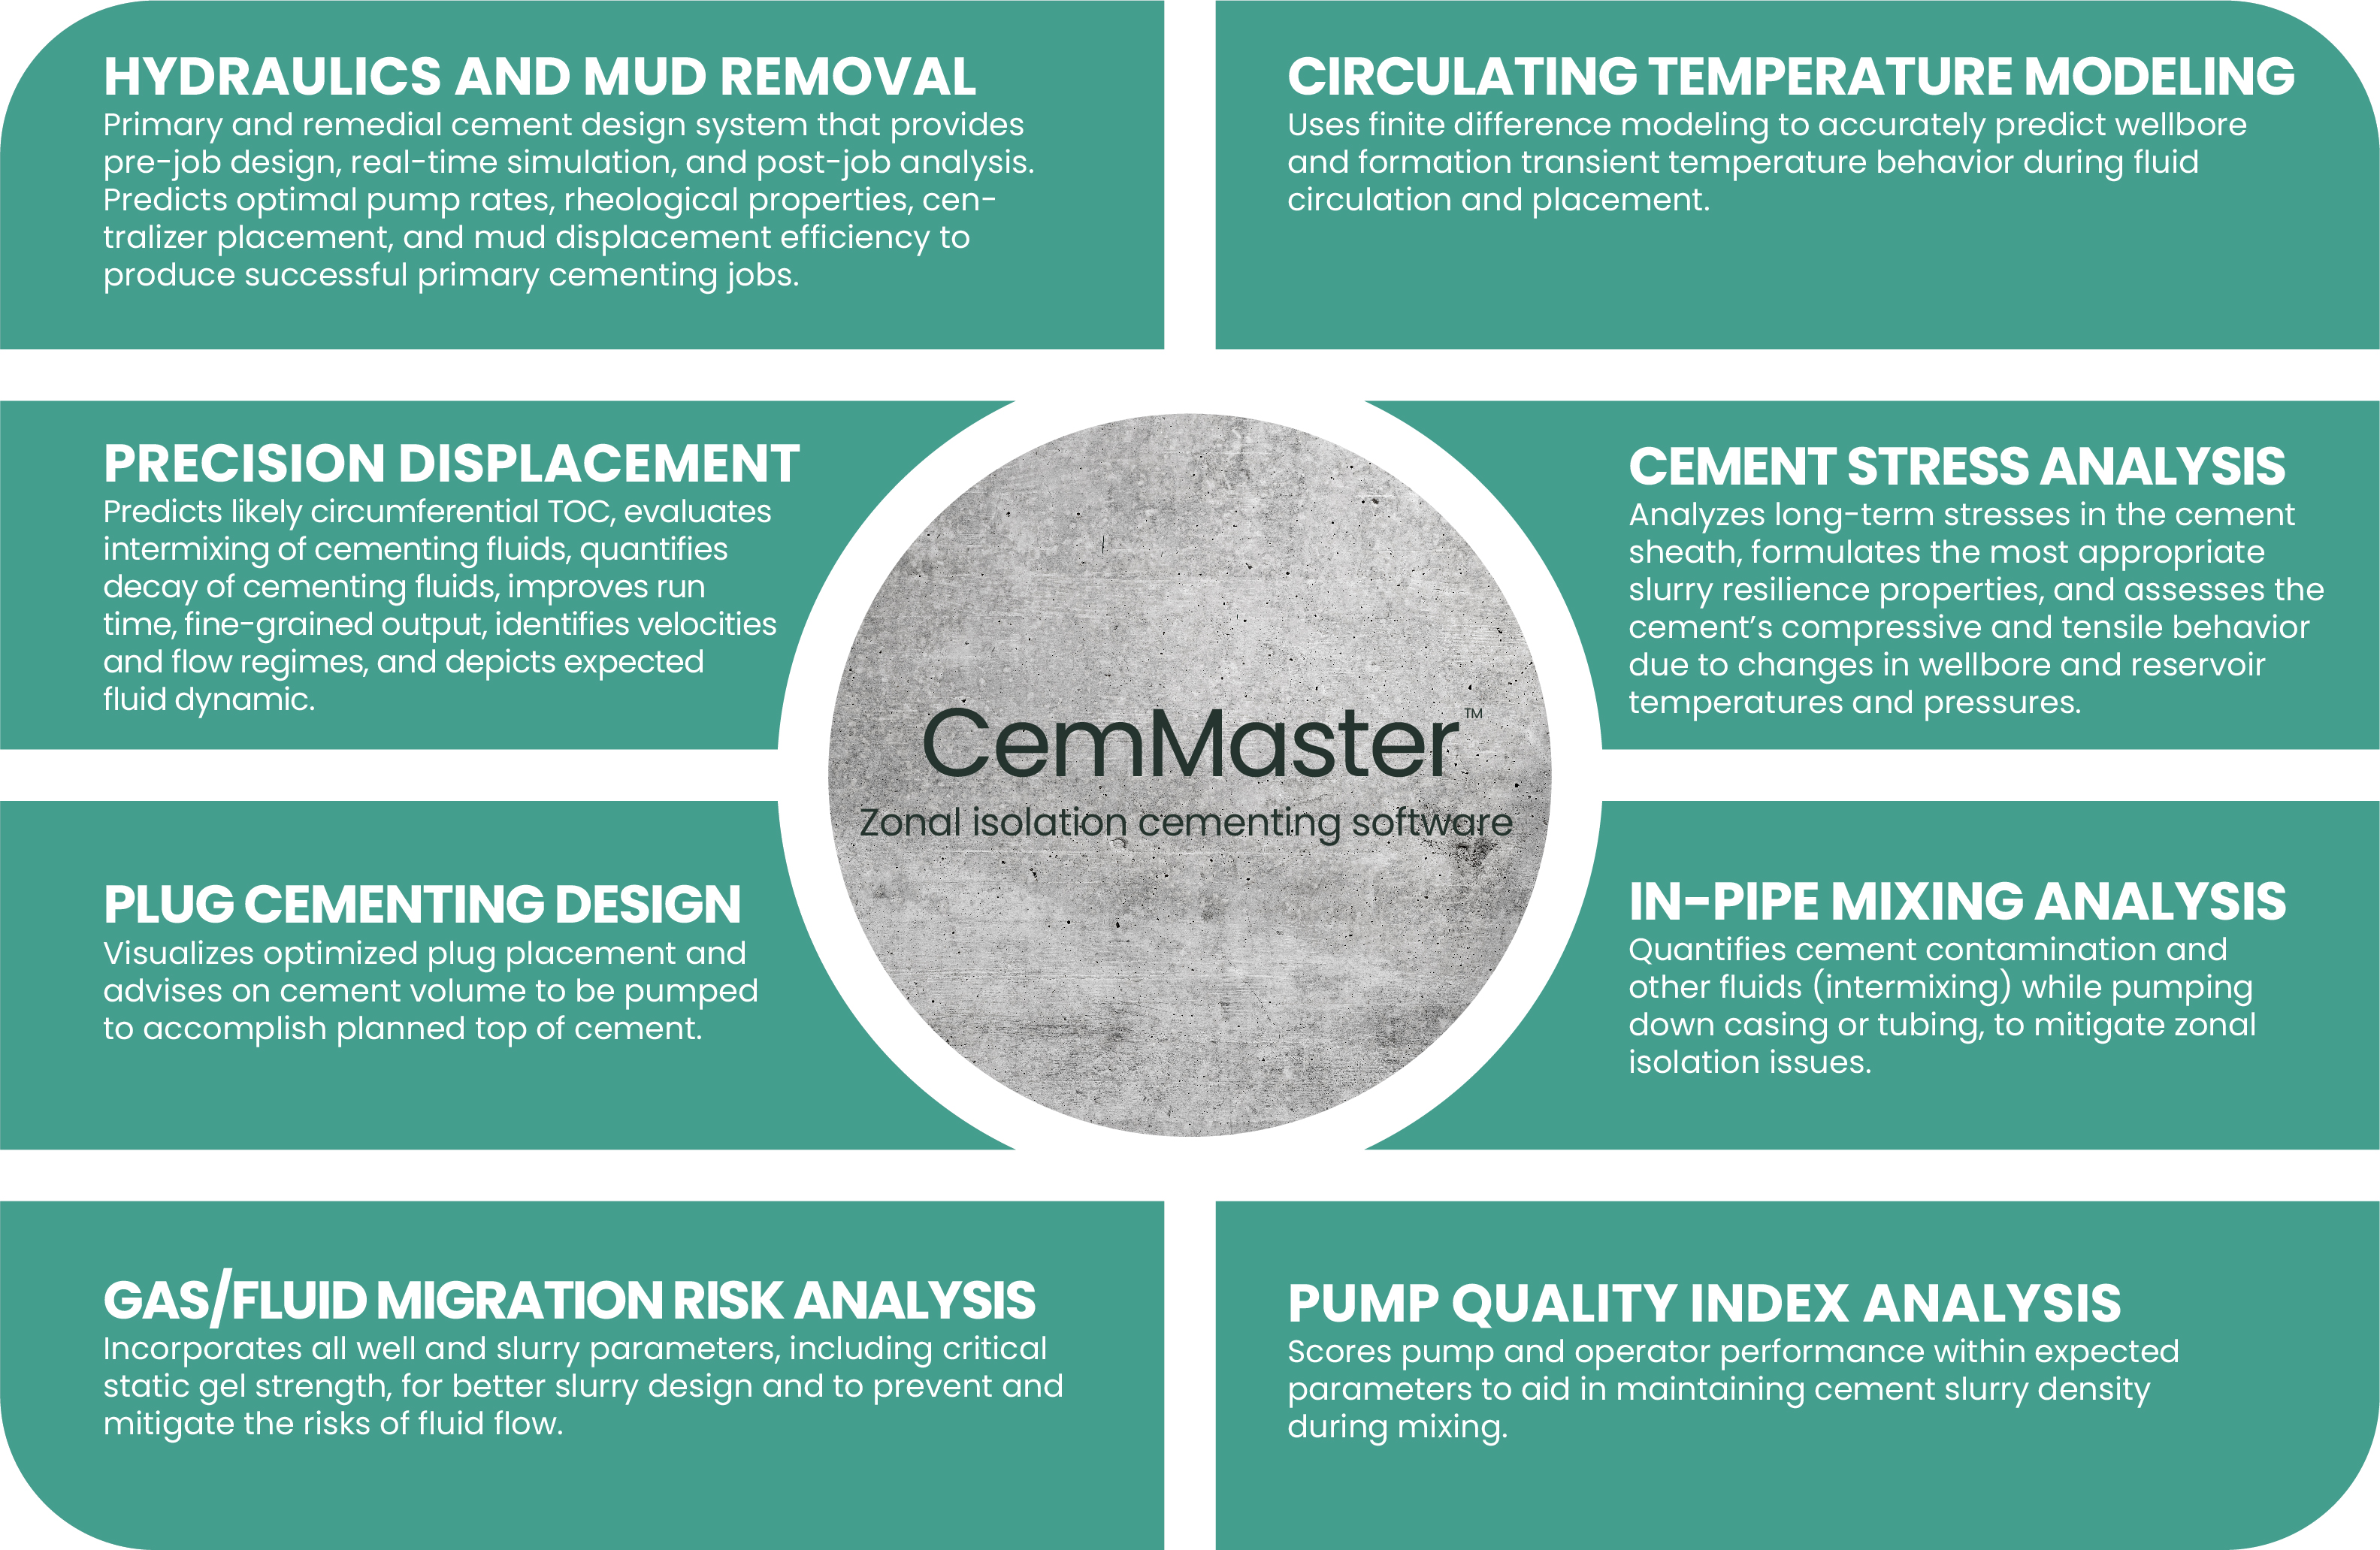 CemMaster module